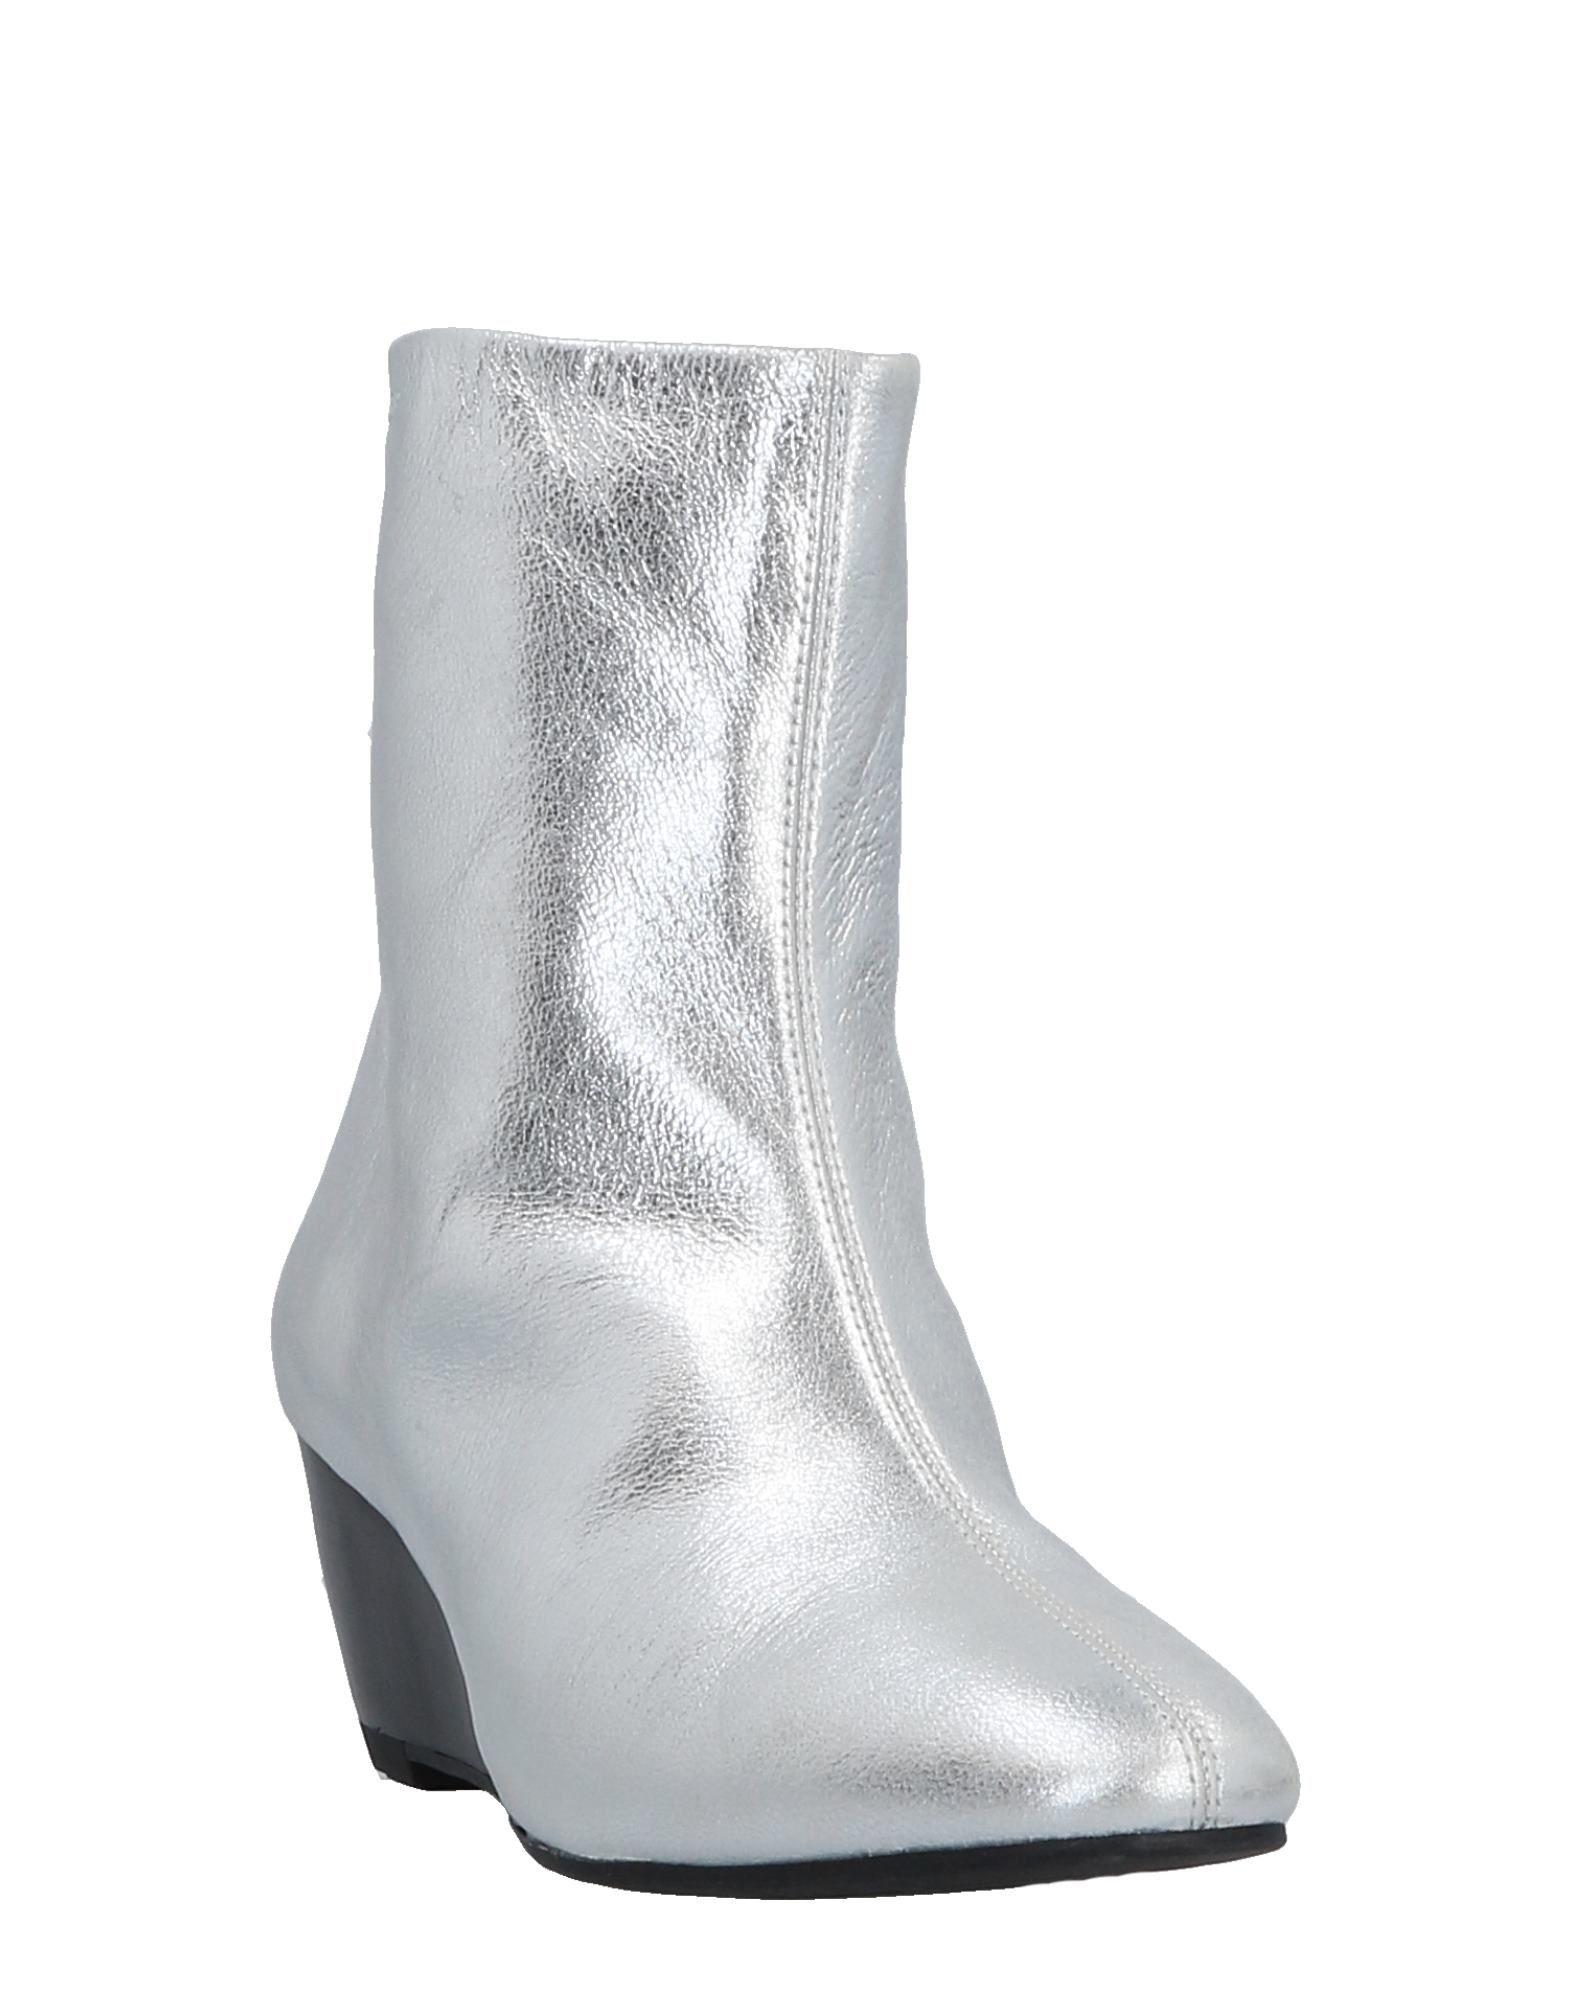 Stilvolle billige Schuhe Vagabond Vagabond Vagabond Shoemakers Stiefelette Damen  11512876GS 843e00